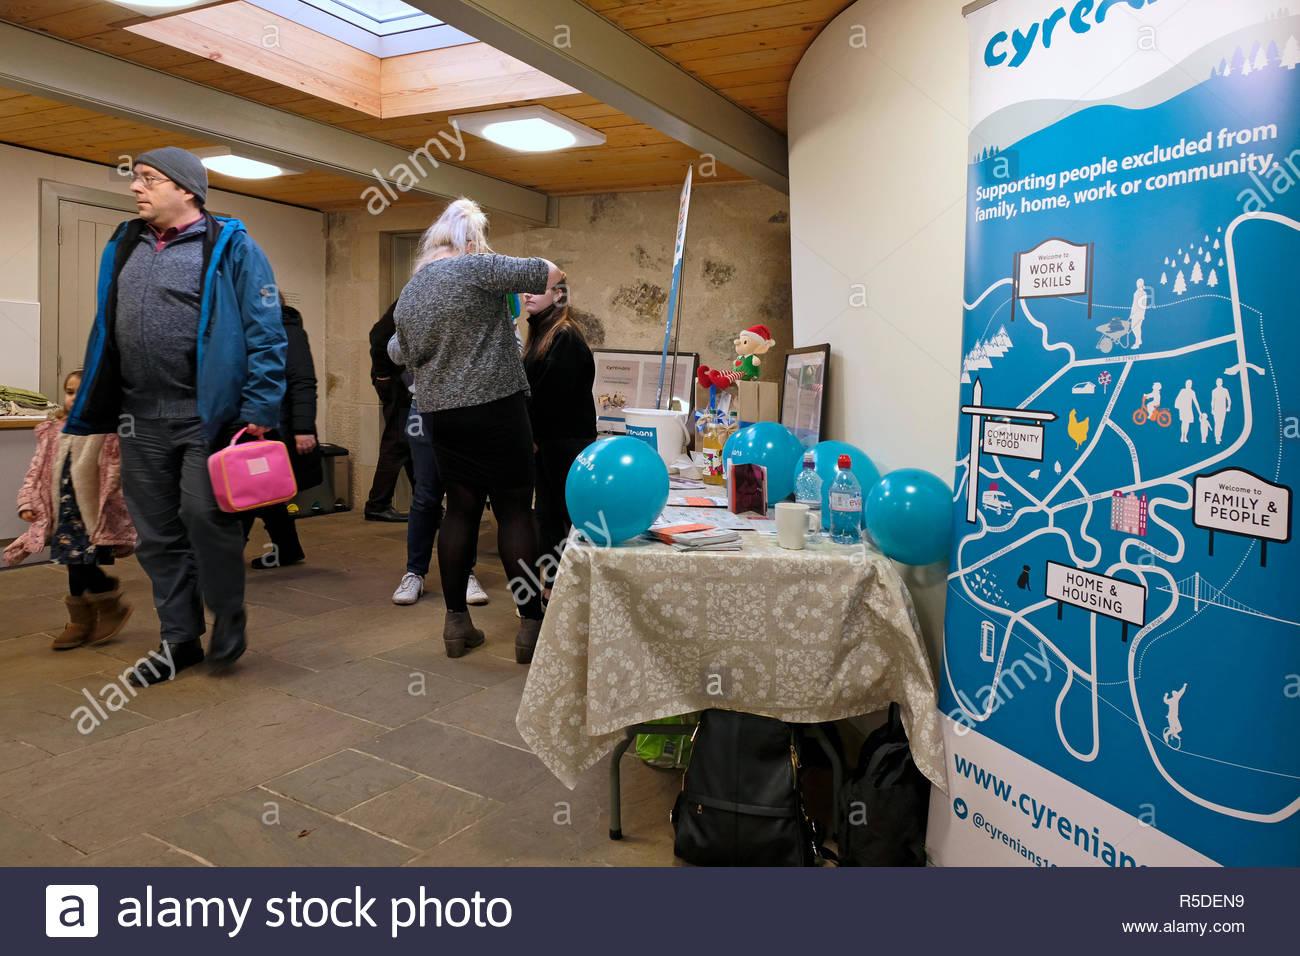 Edinburgh, Scotland, United Kingdom. 1st December,  2018.  St. Andrew Fair Event at the Botanic Cottage, Royal Botanic Garden, raising money for the Cyrenians charity helping the homeless.   Credit: Craig Brown/Alamy Live News. Stock Photo